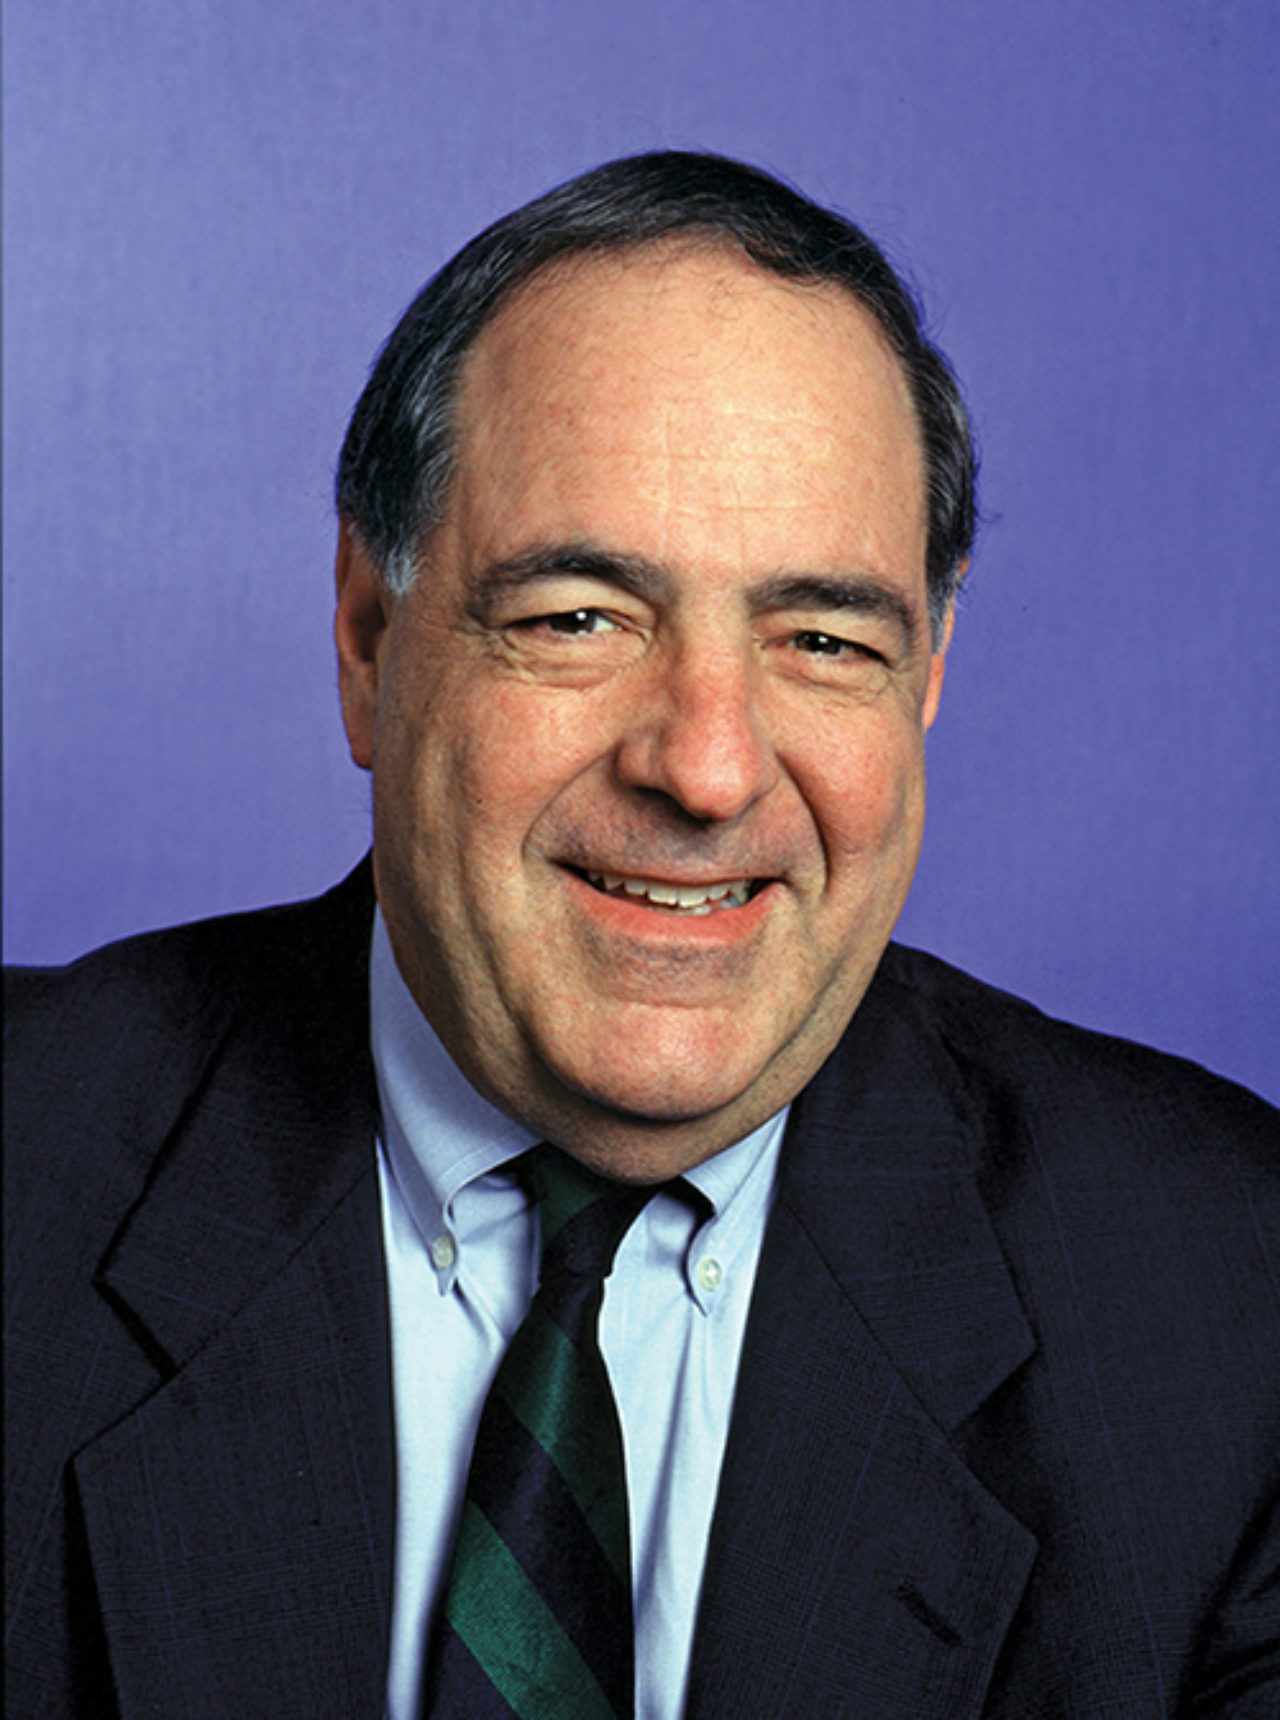 Vince Naimoli